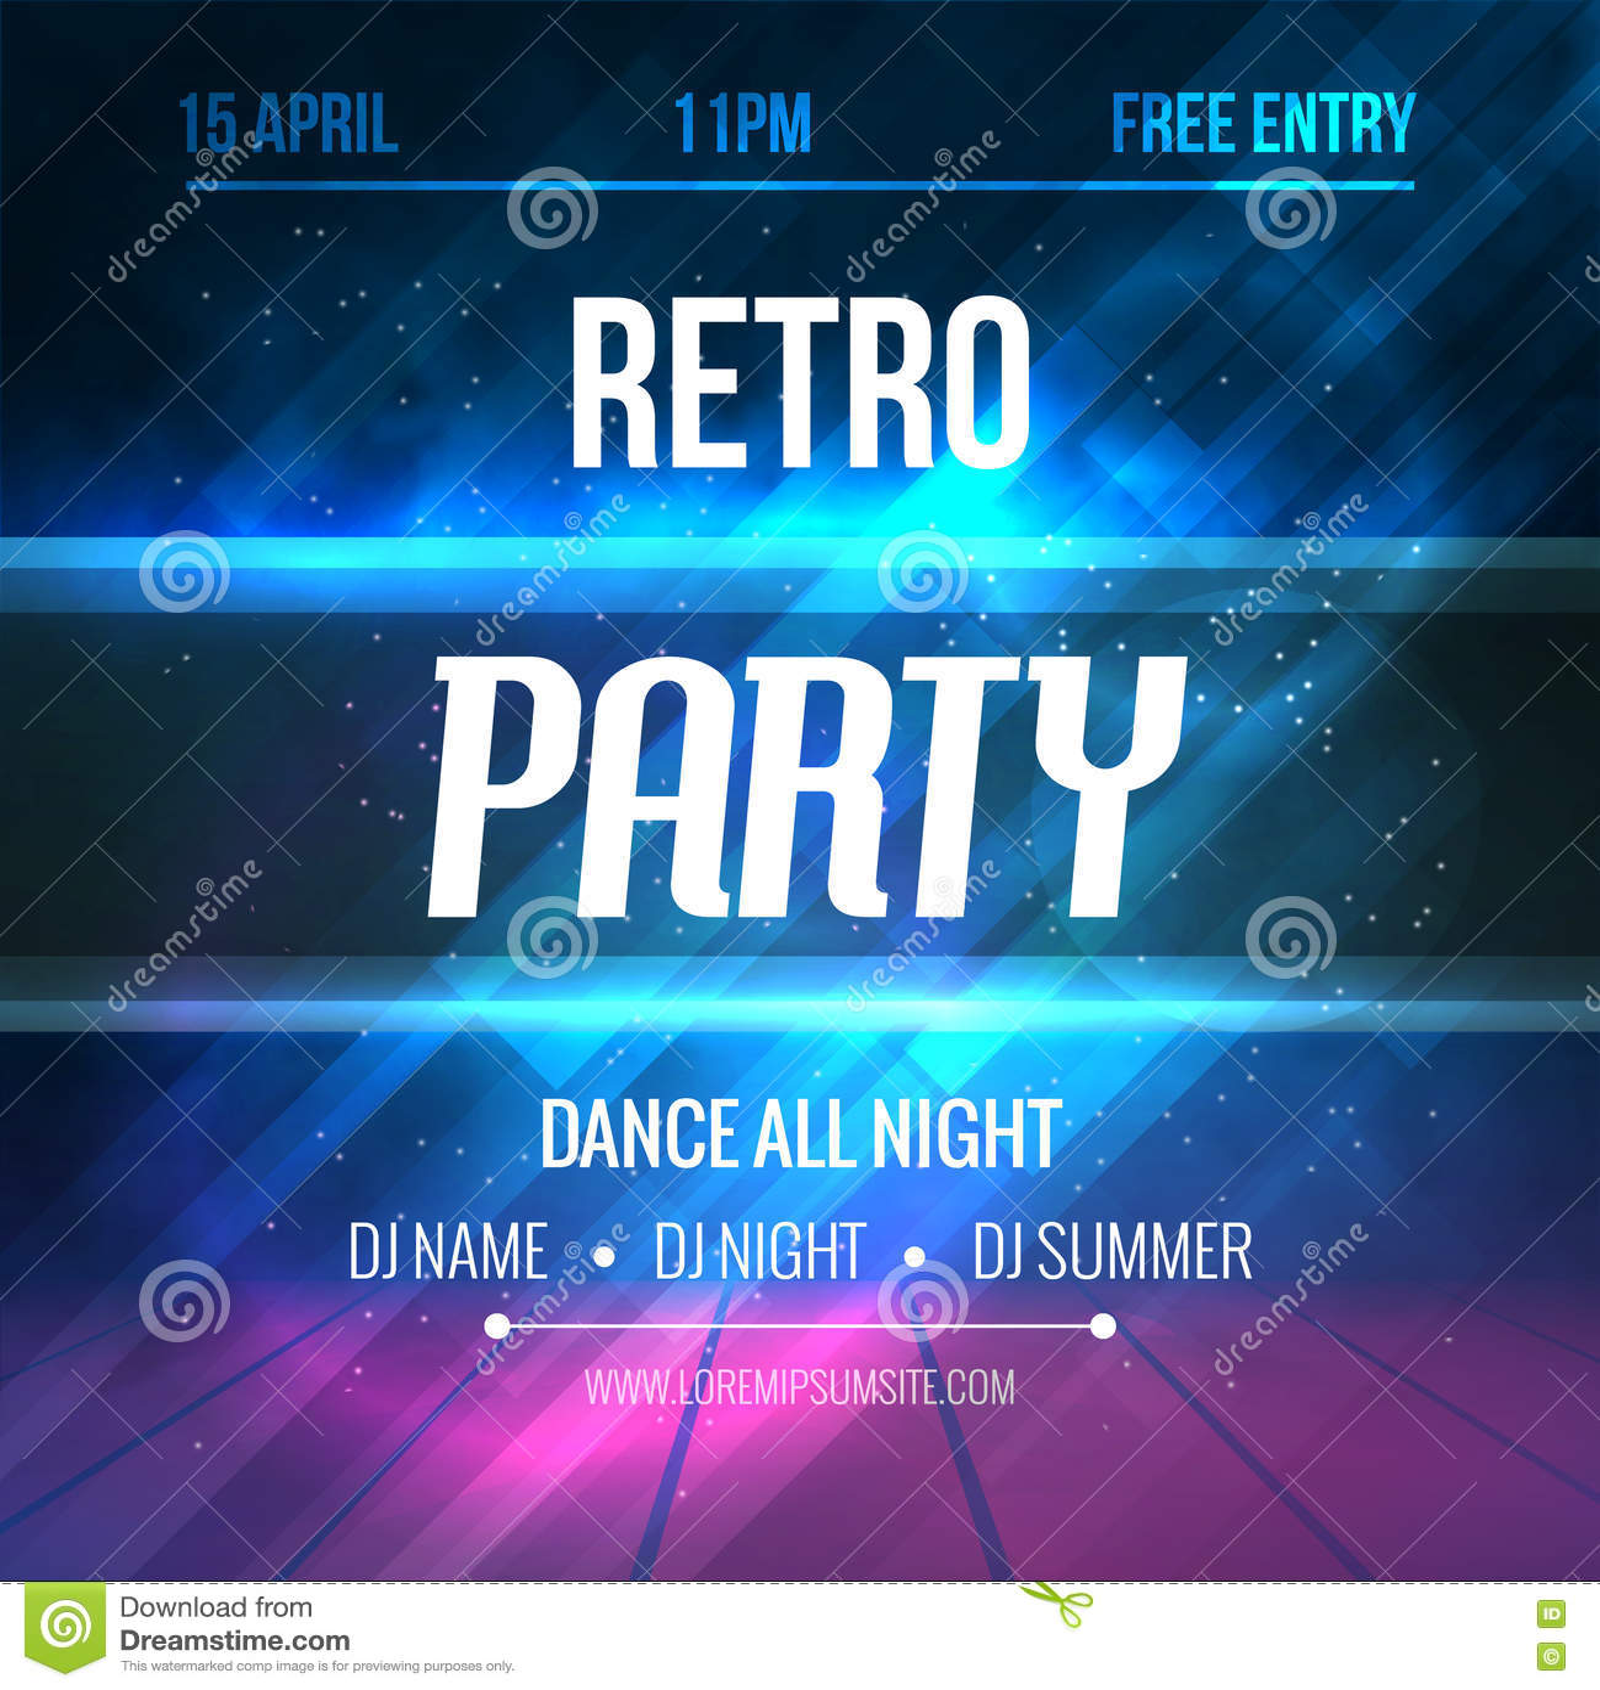 70s poster design template - Dance Retro Party Poster Template Night Retro Dance Party Flyer Club Party Design Template